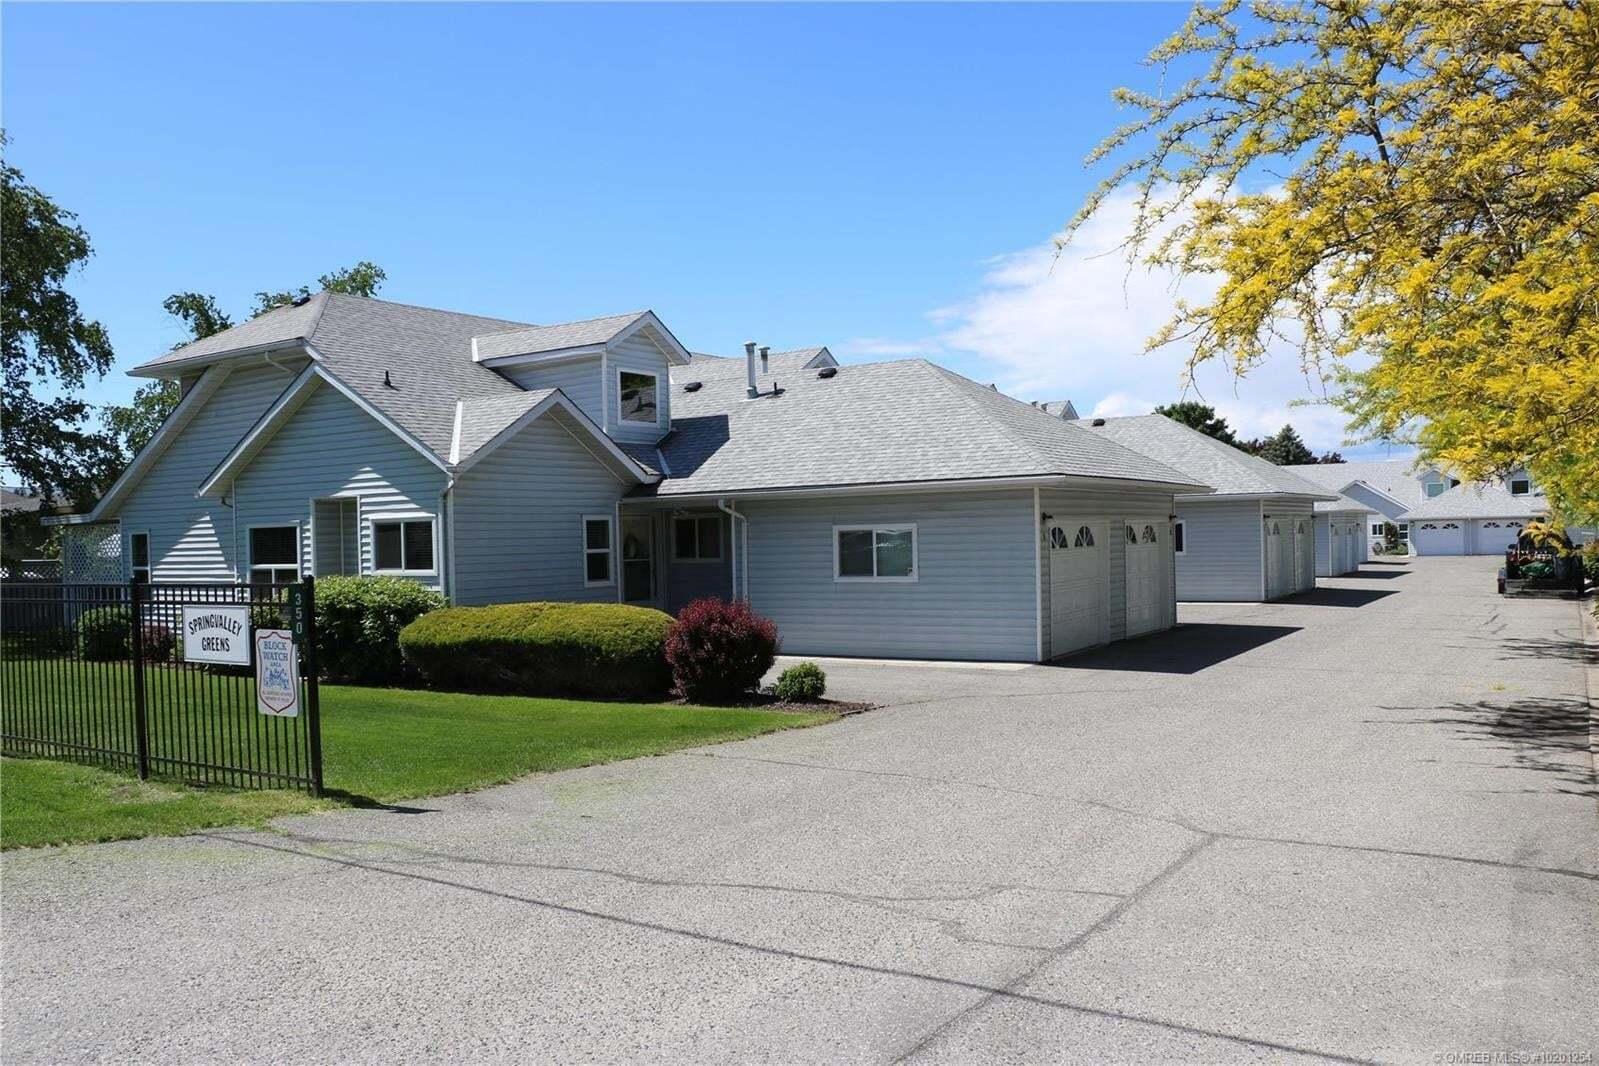 Townhouse for sale at 350 Davie Rd Kelowna British Columbia - MLS: 10201254